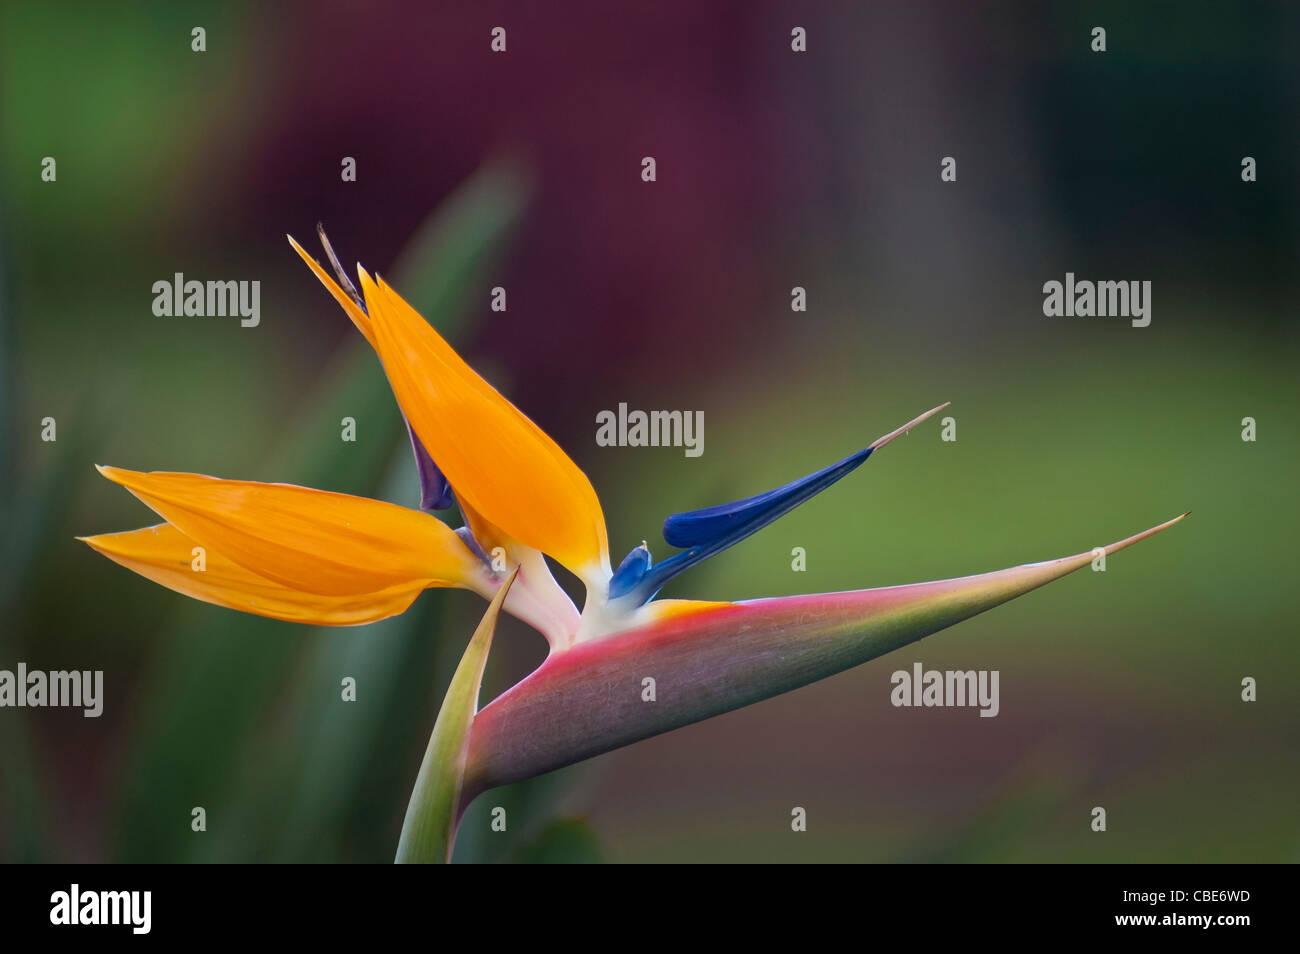 Bird of Paradise flower (Strelitzia reginae); Hawaii. - Stock Image